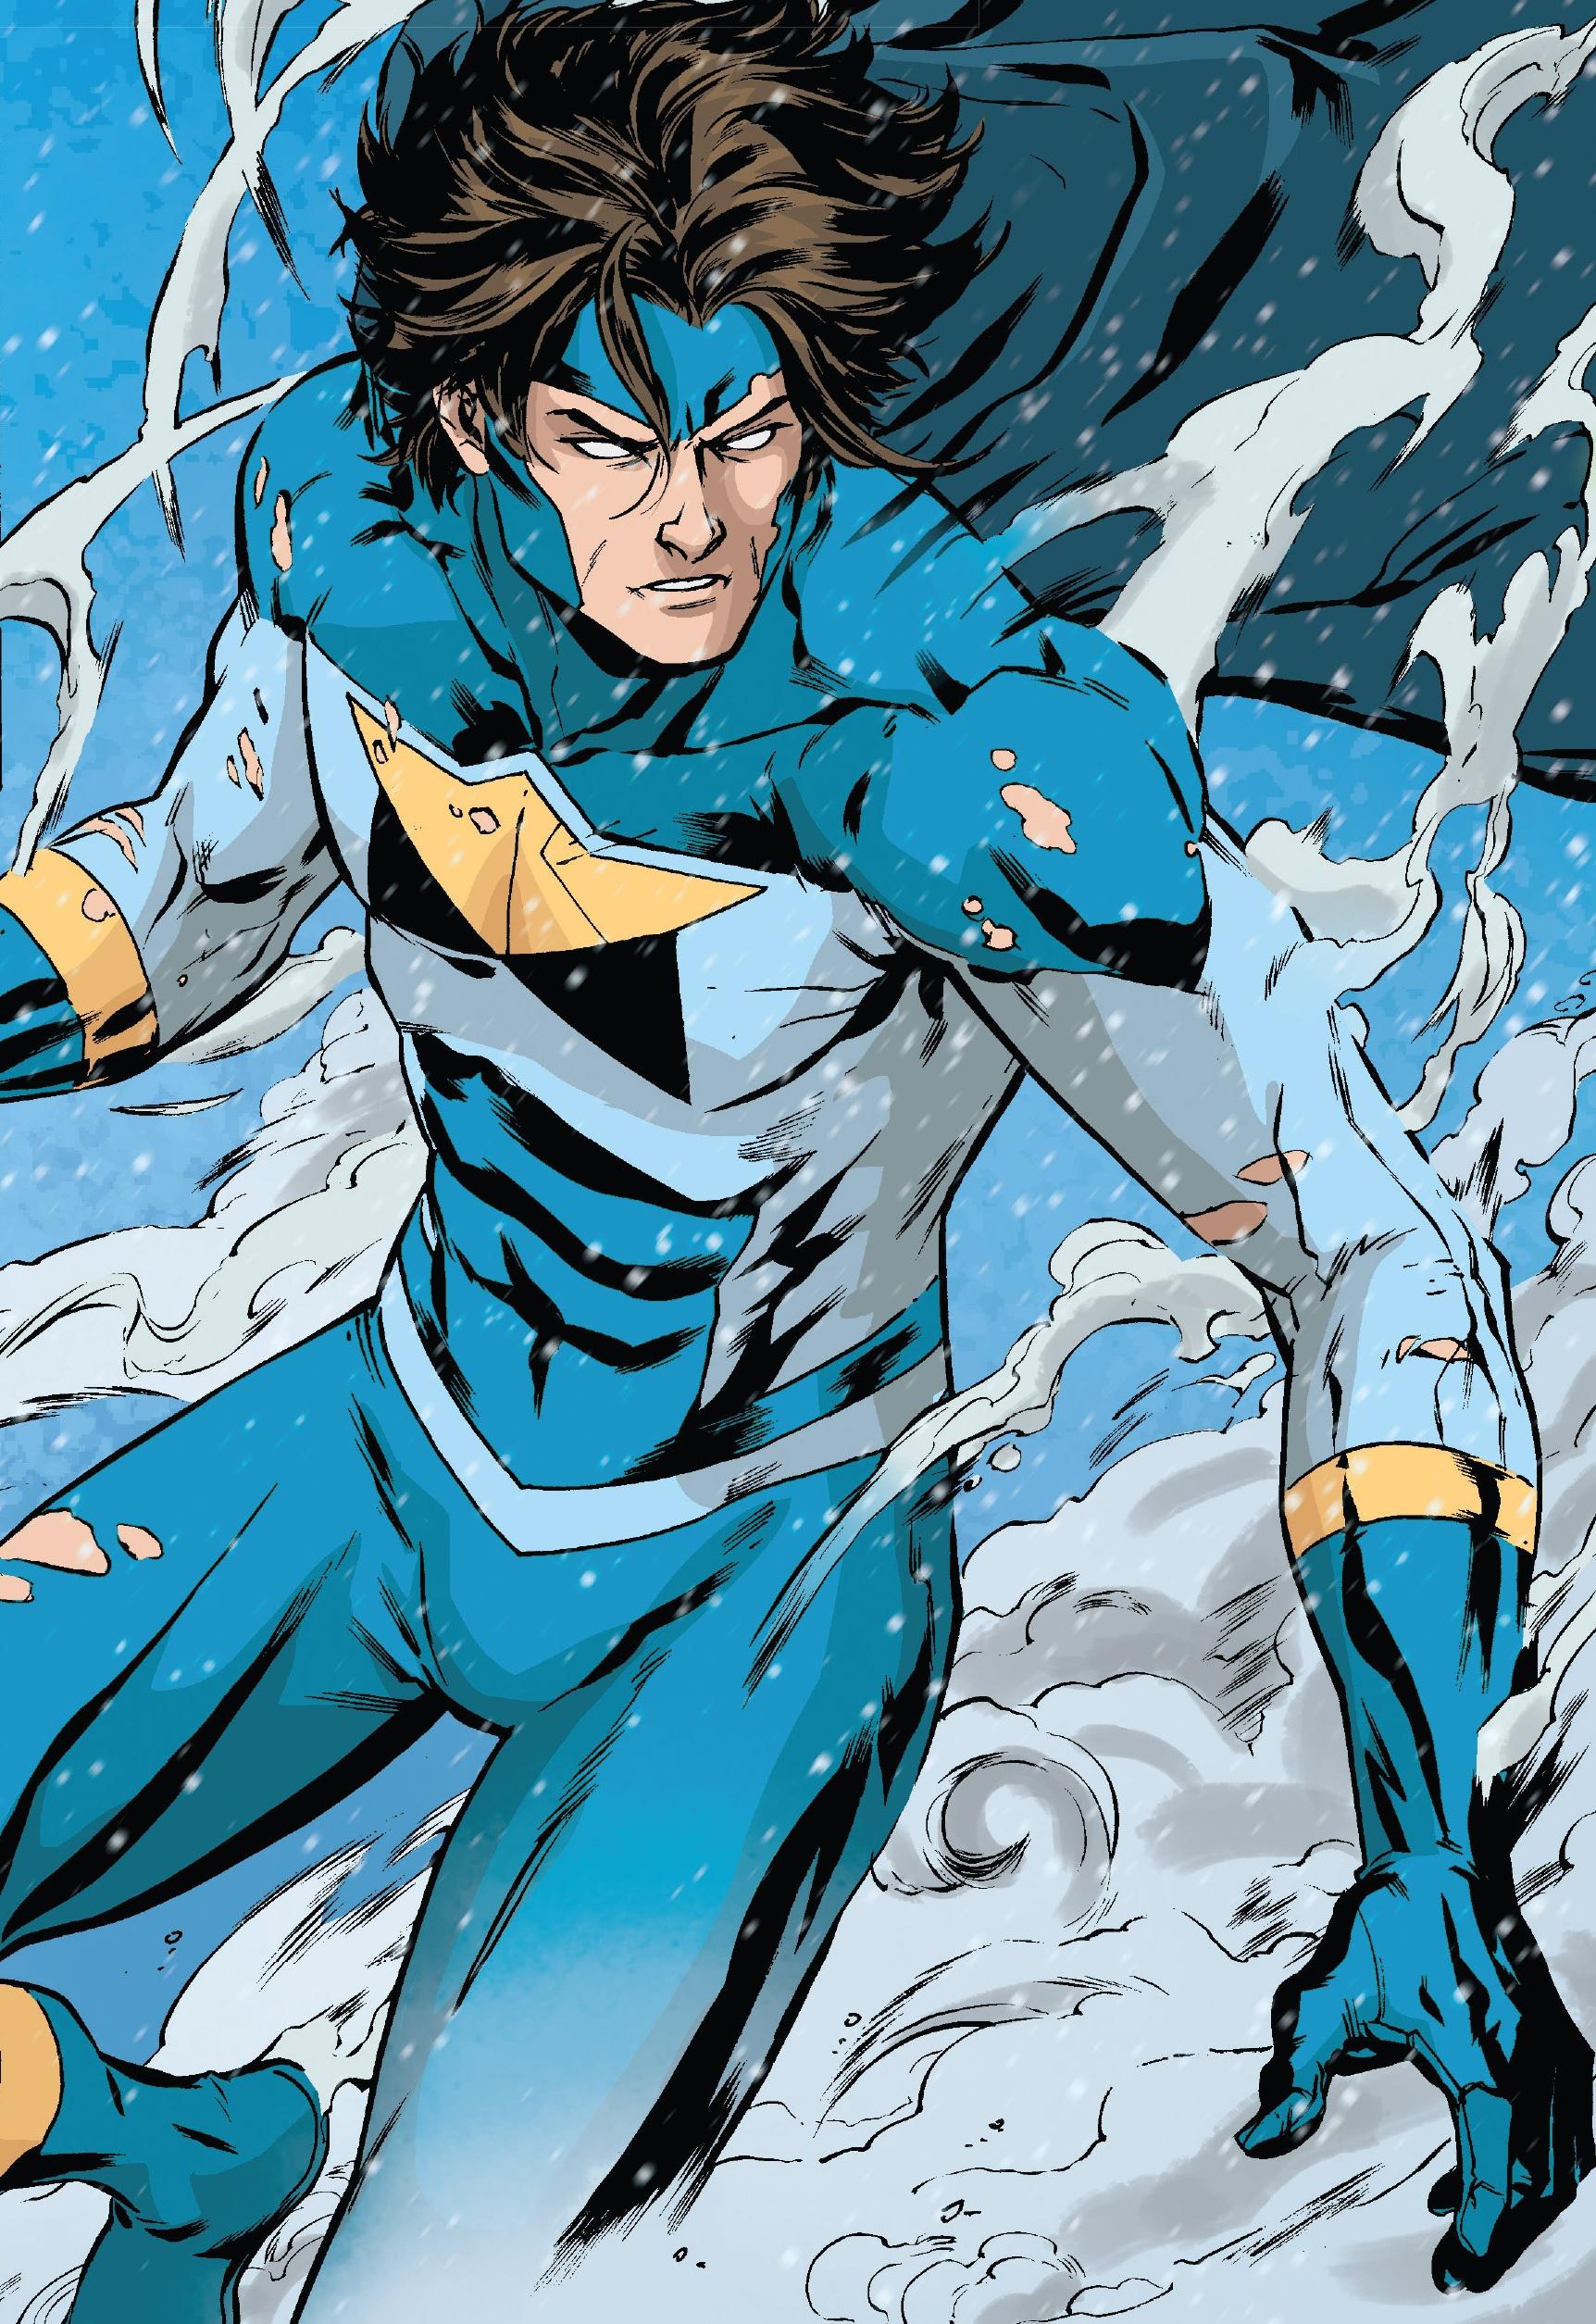 Vance Astrovik (Earth-616) | Marvel Database | Fandom